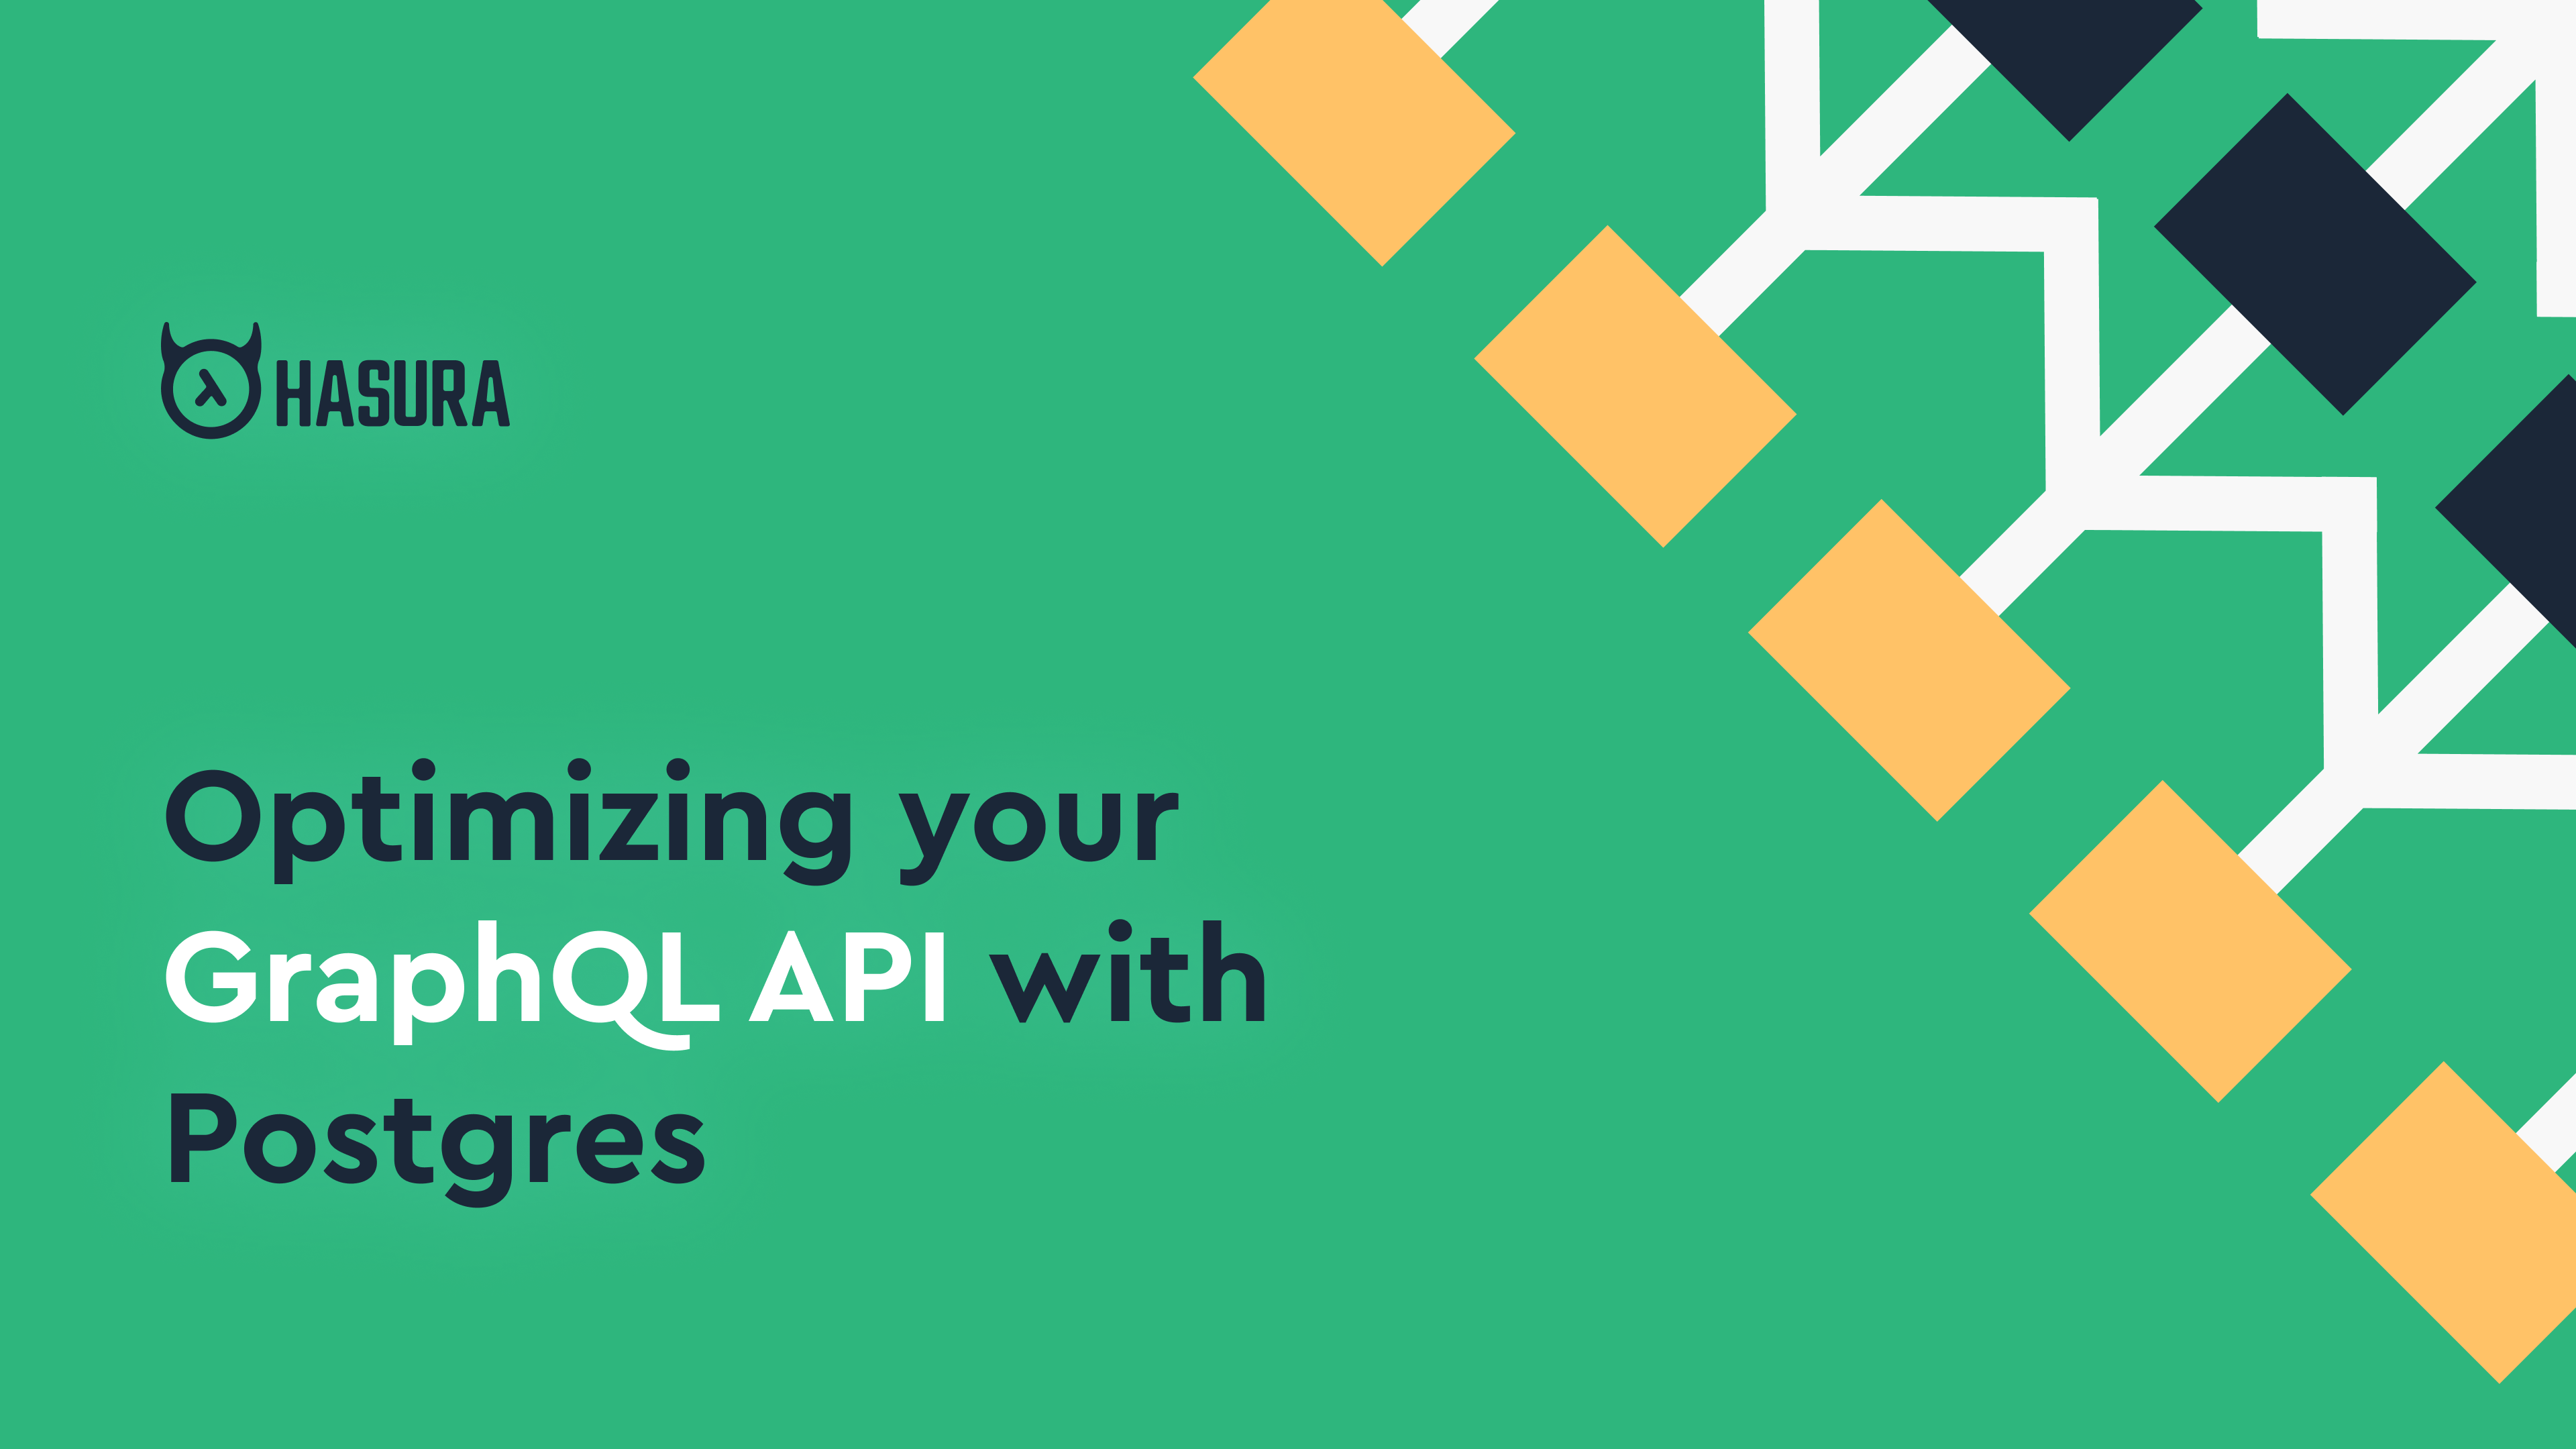 Optimizing your GraphQL API with Postgres